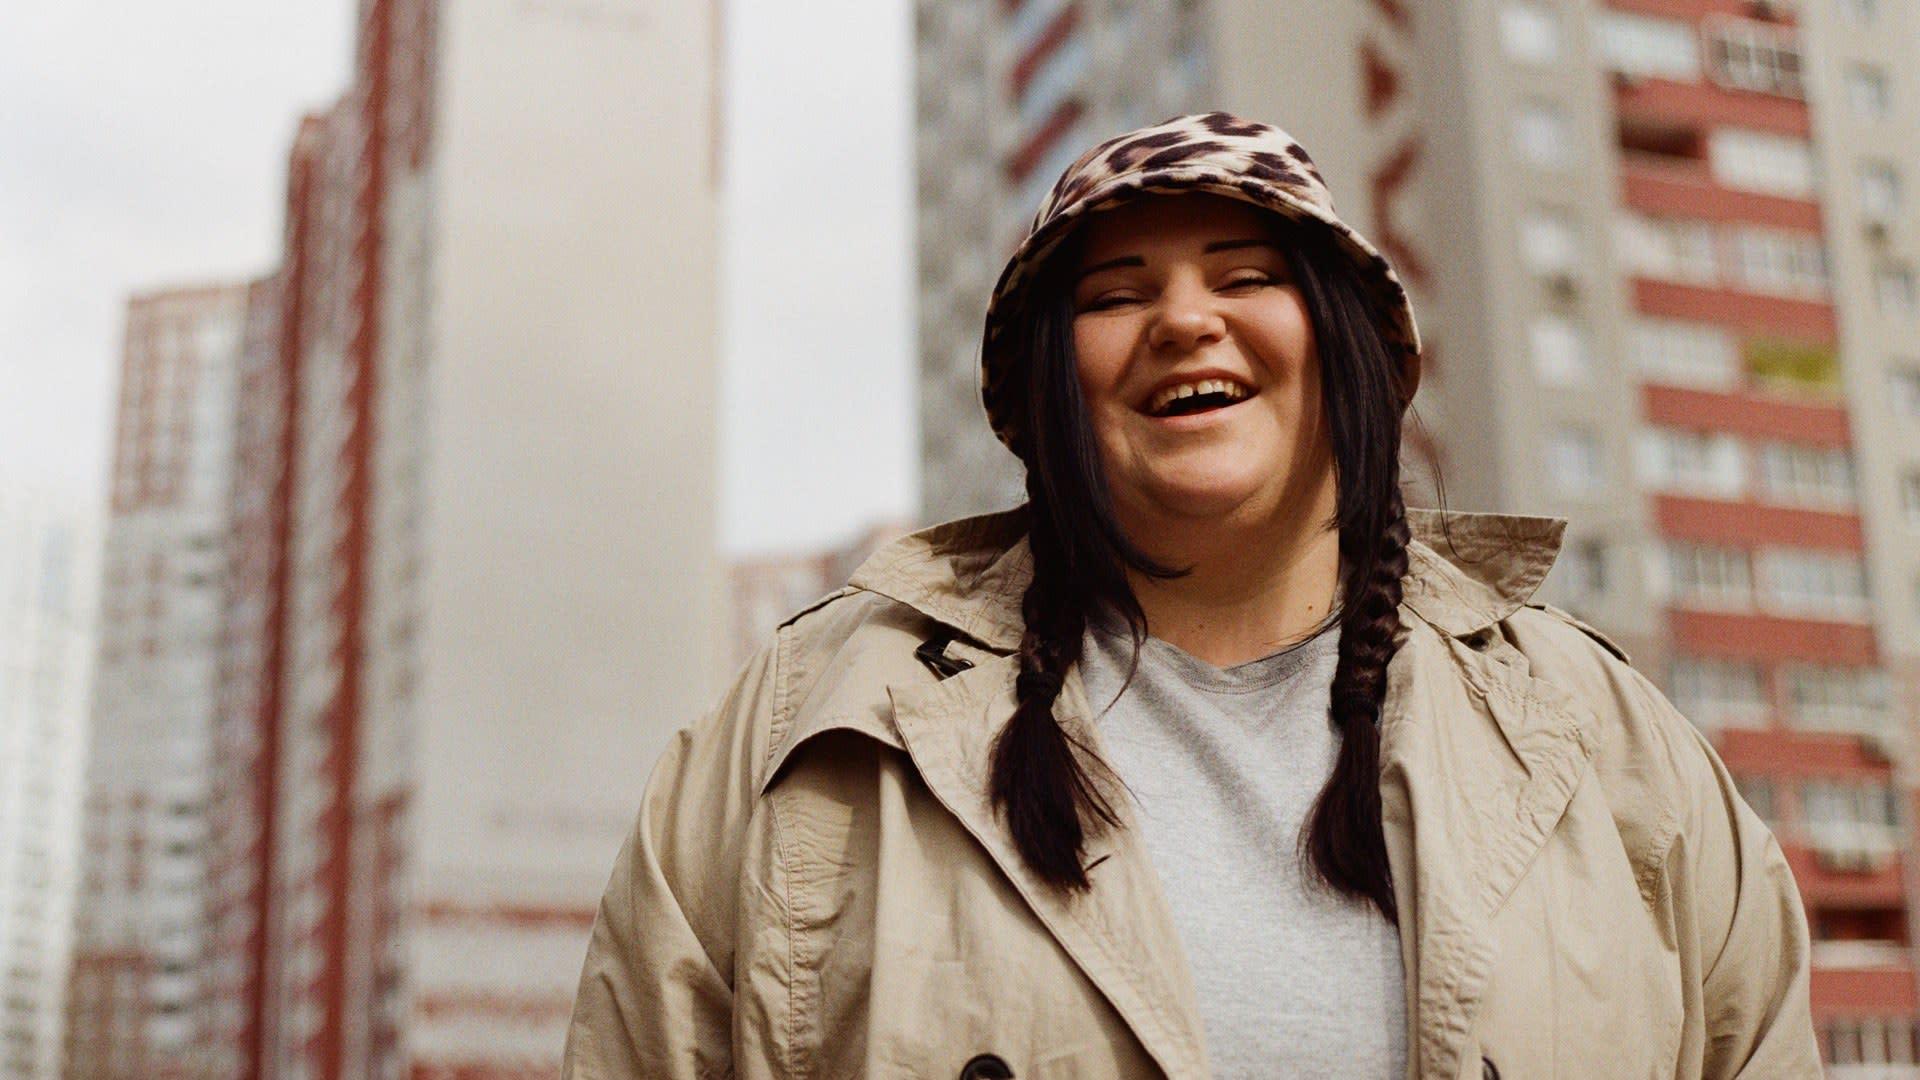 Meet Alyona Alyona, Ukraine's Most Unlikely Rap Star